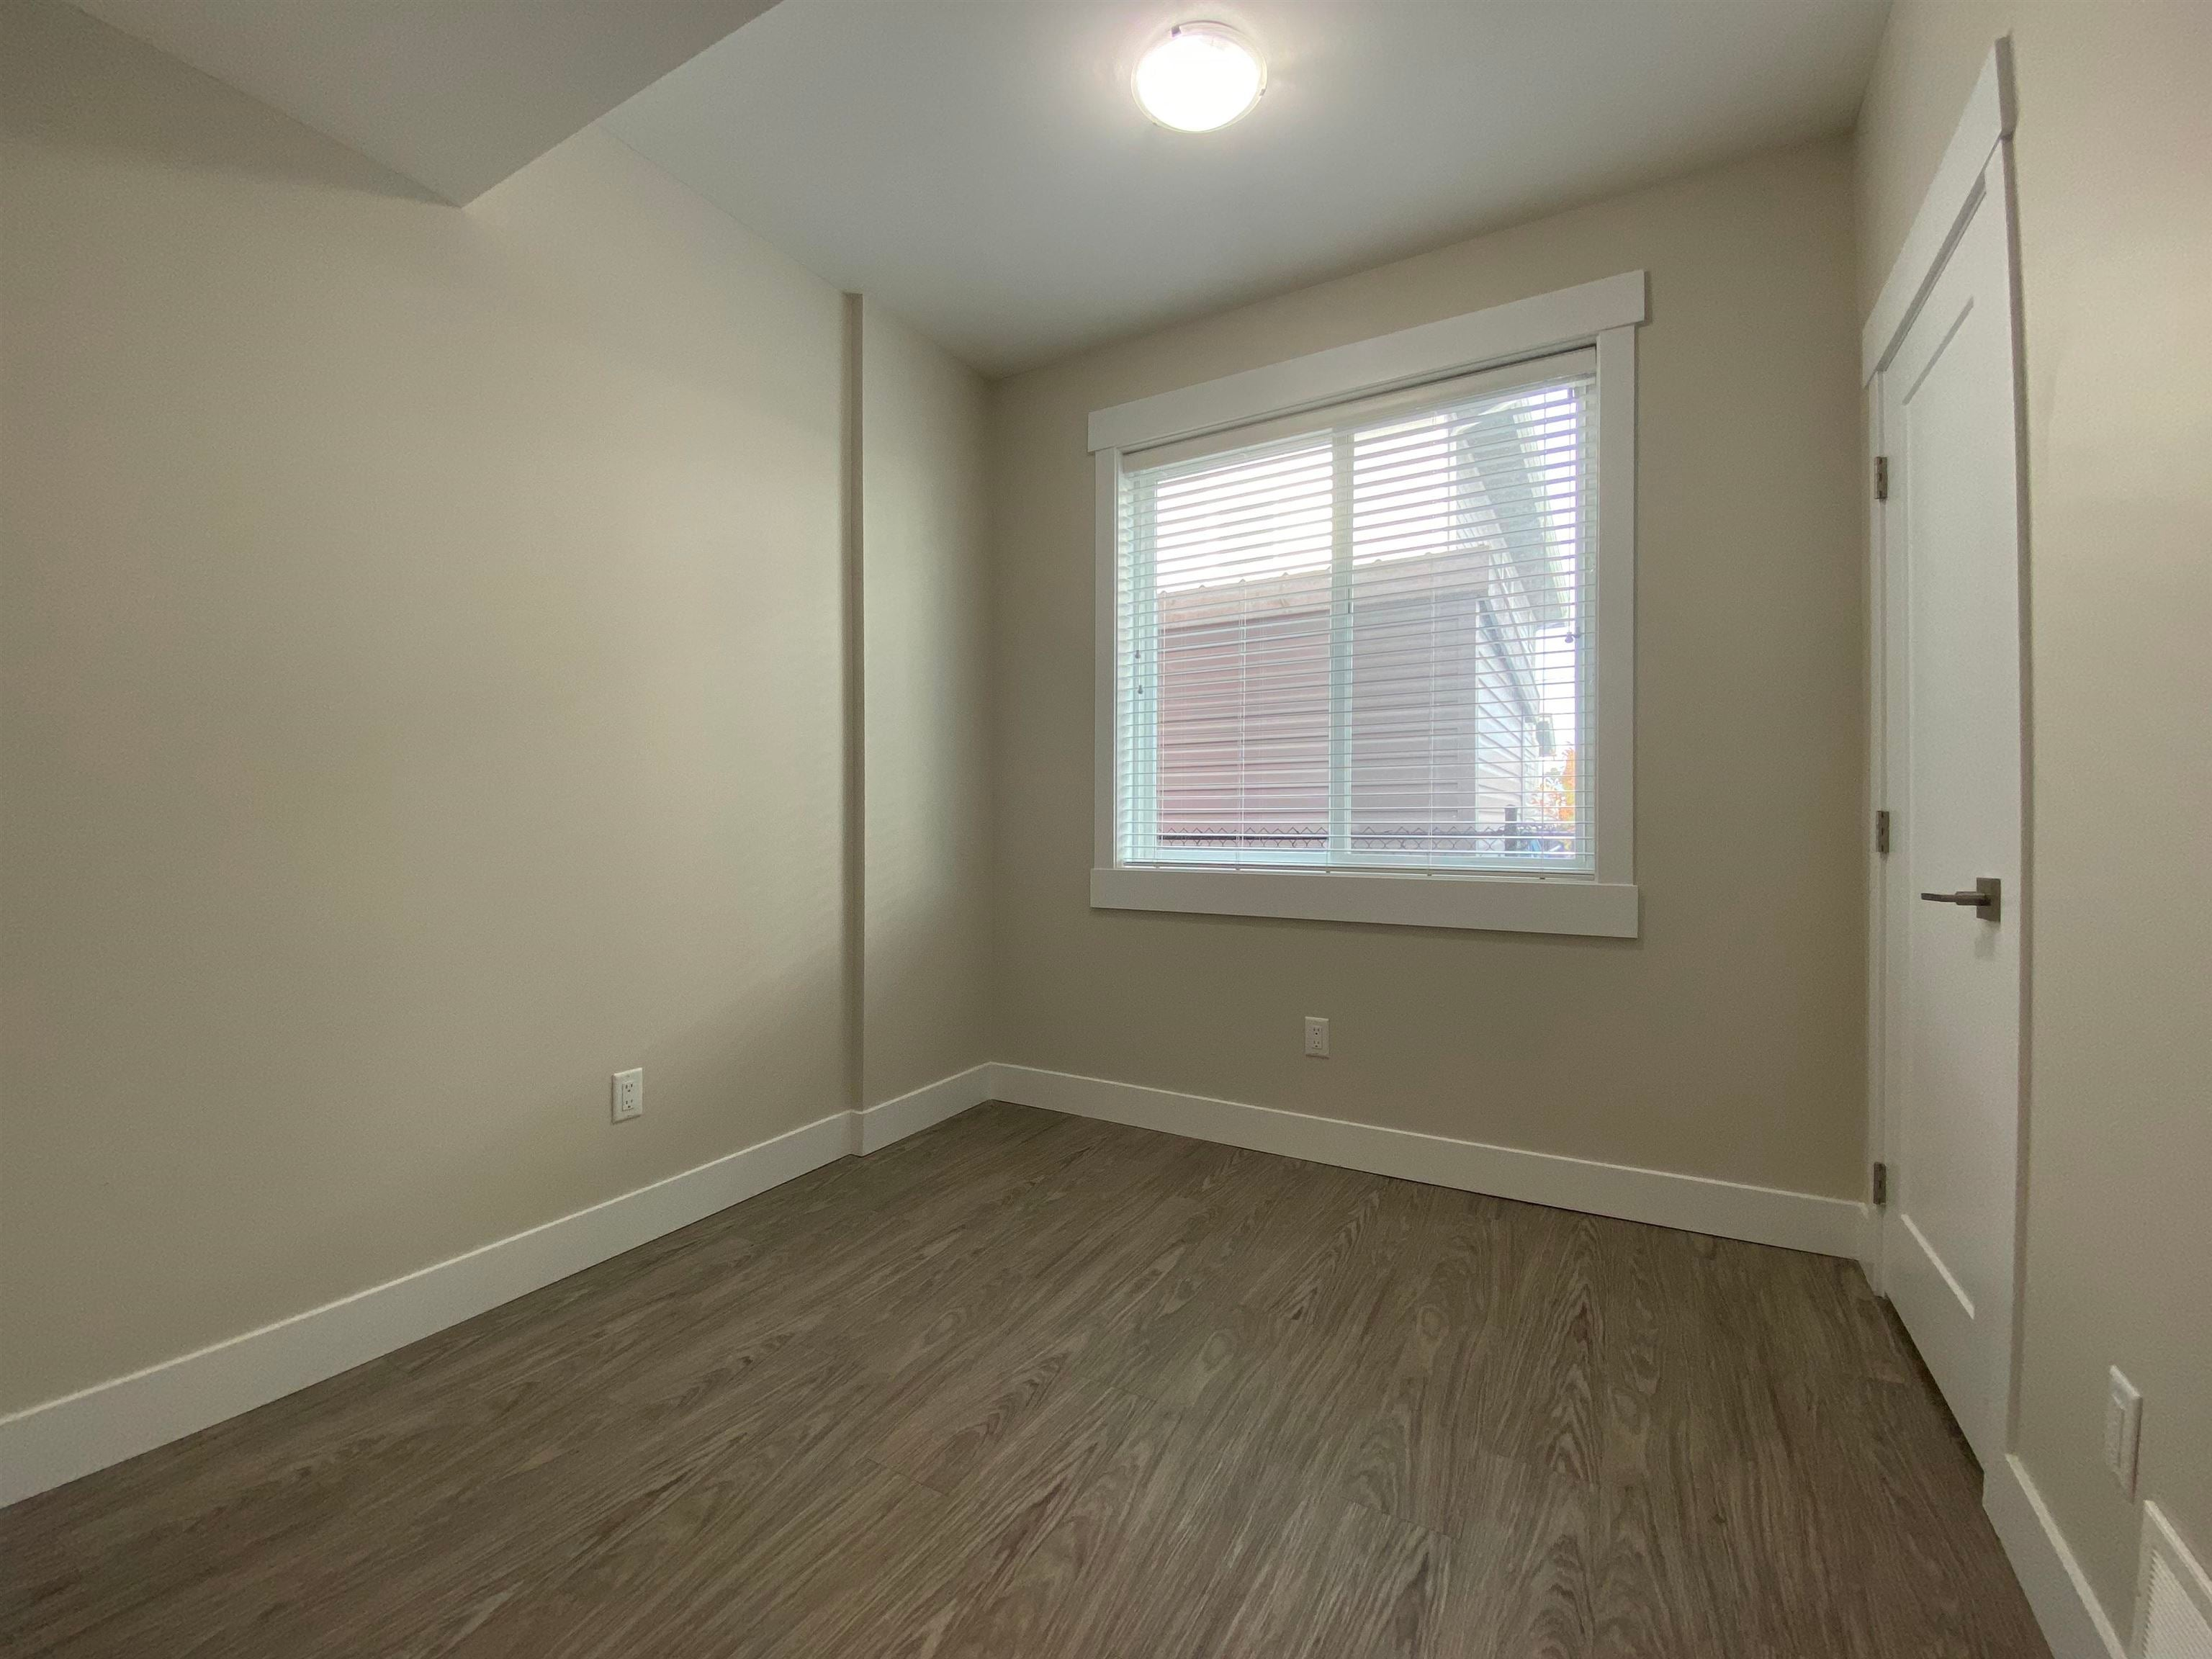 10144 KILLARNEY DRIVE - Fairfield Island House/Single Family for sale, 5 Bedrooms (R2625716) - #29